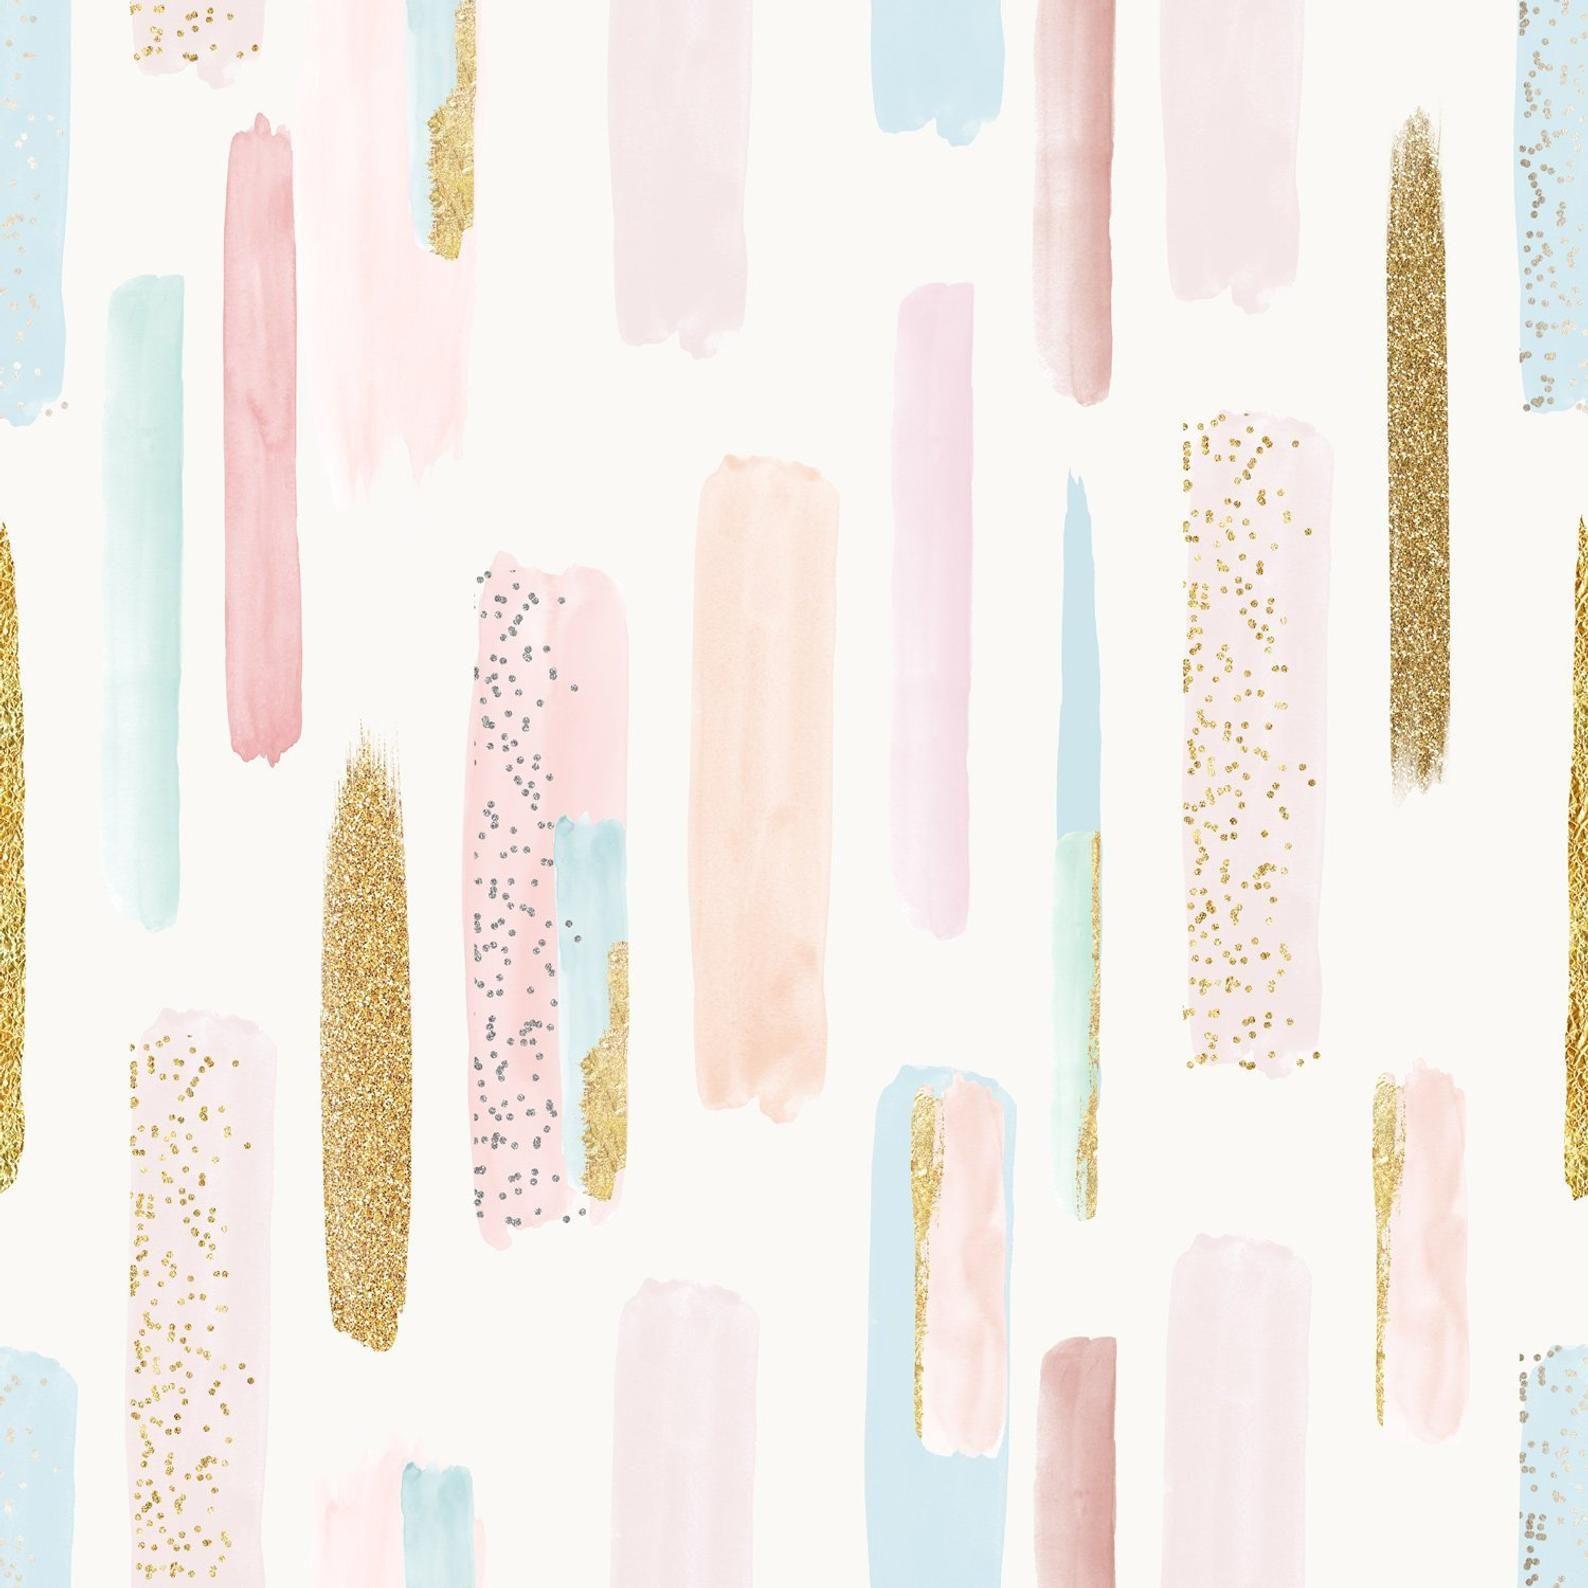 Brush Strokes Wallpaper Watercolor Wallpaper Splash Wall Etsy In 2020 Watercolor Wallpaper Gold Wallpaper Pink And Gold Wallpaper